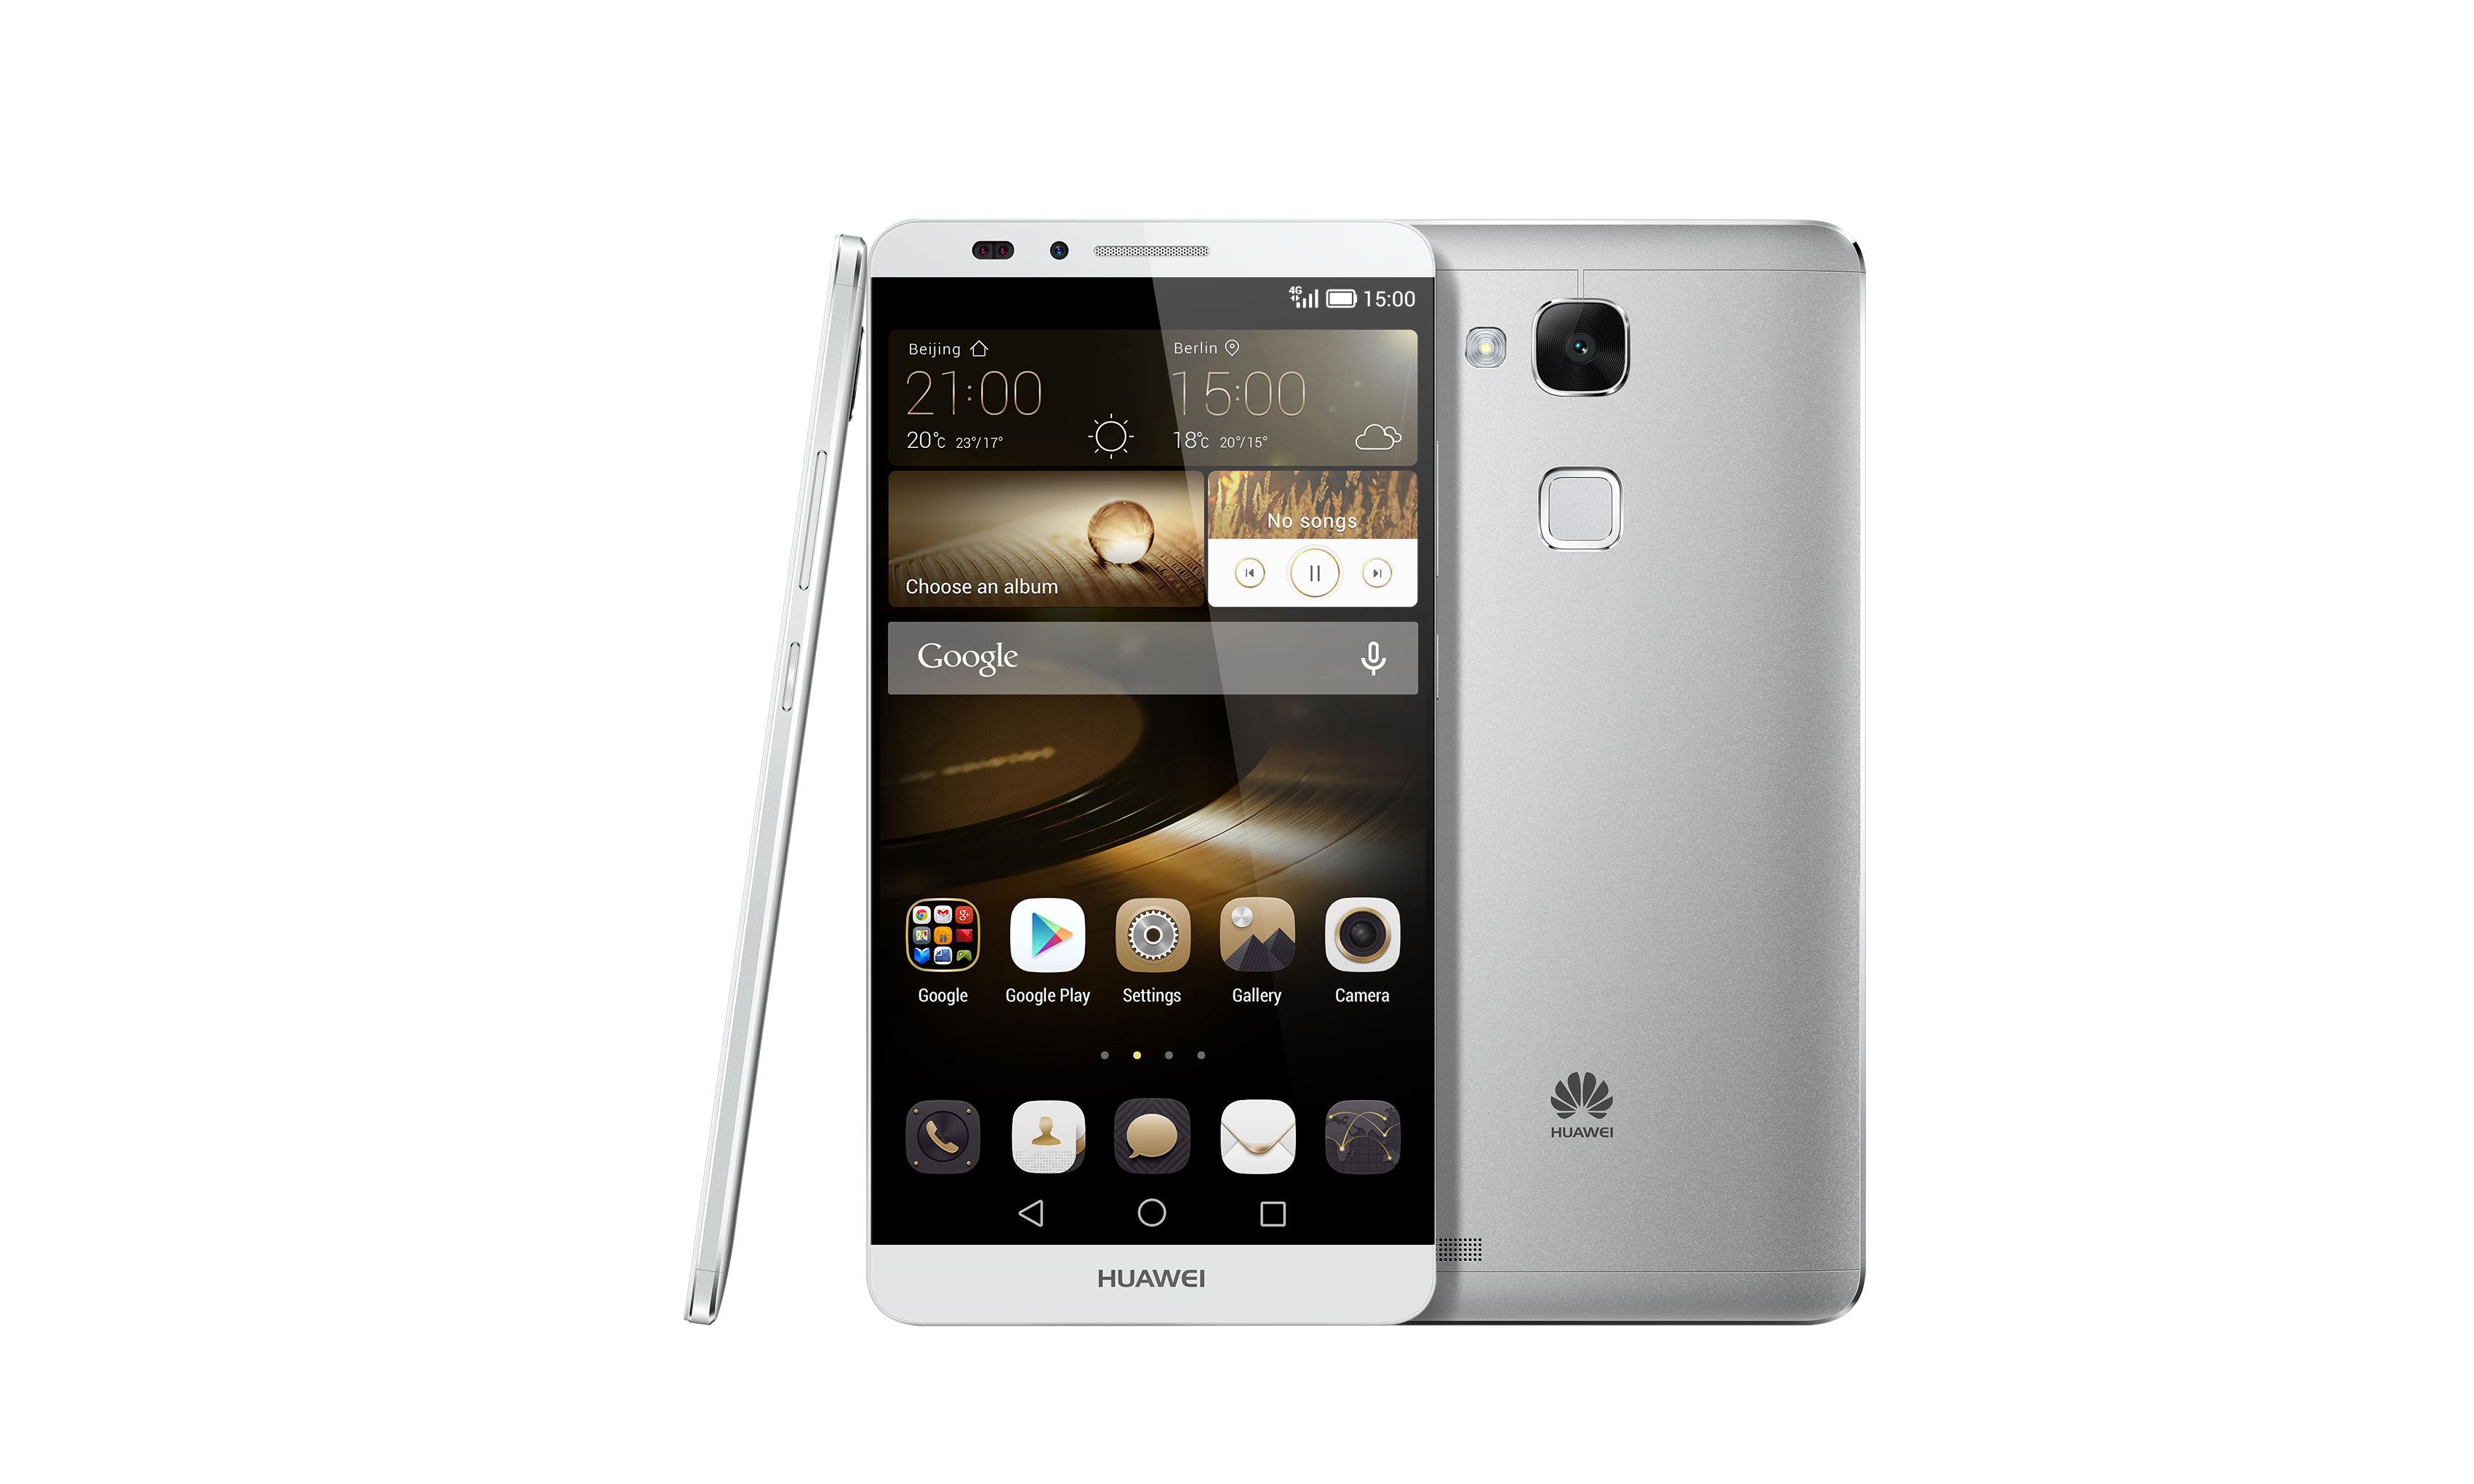 4e19bff3699 Huawei Ascend Mate 7 presentado oficialmente   Teknikop